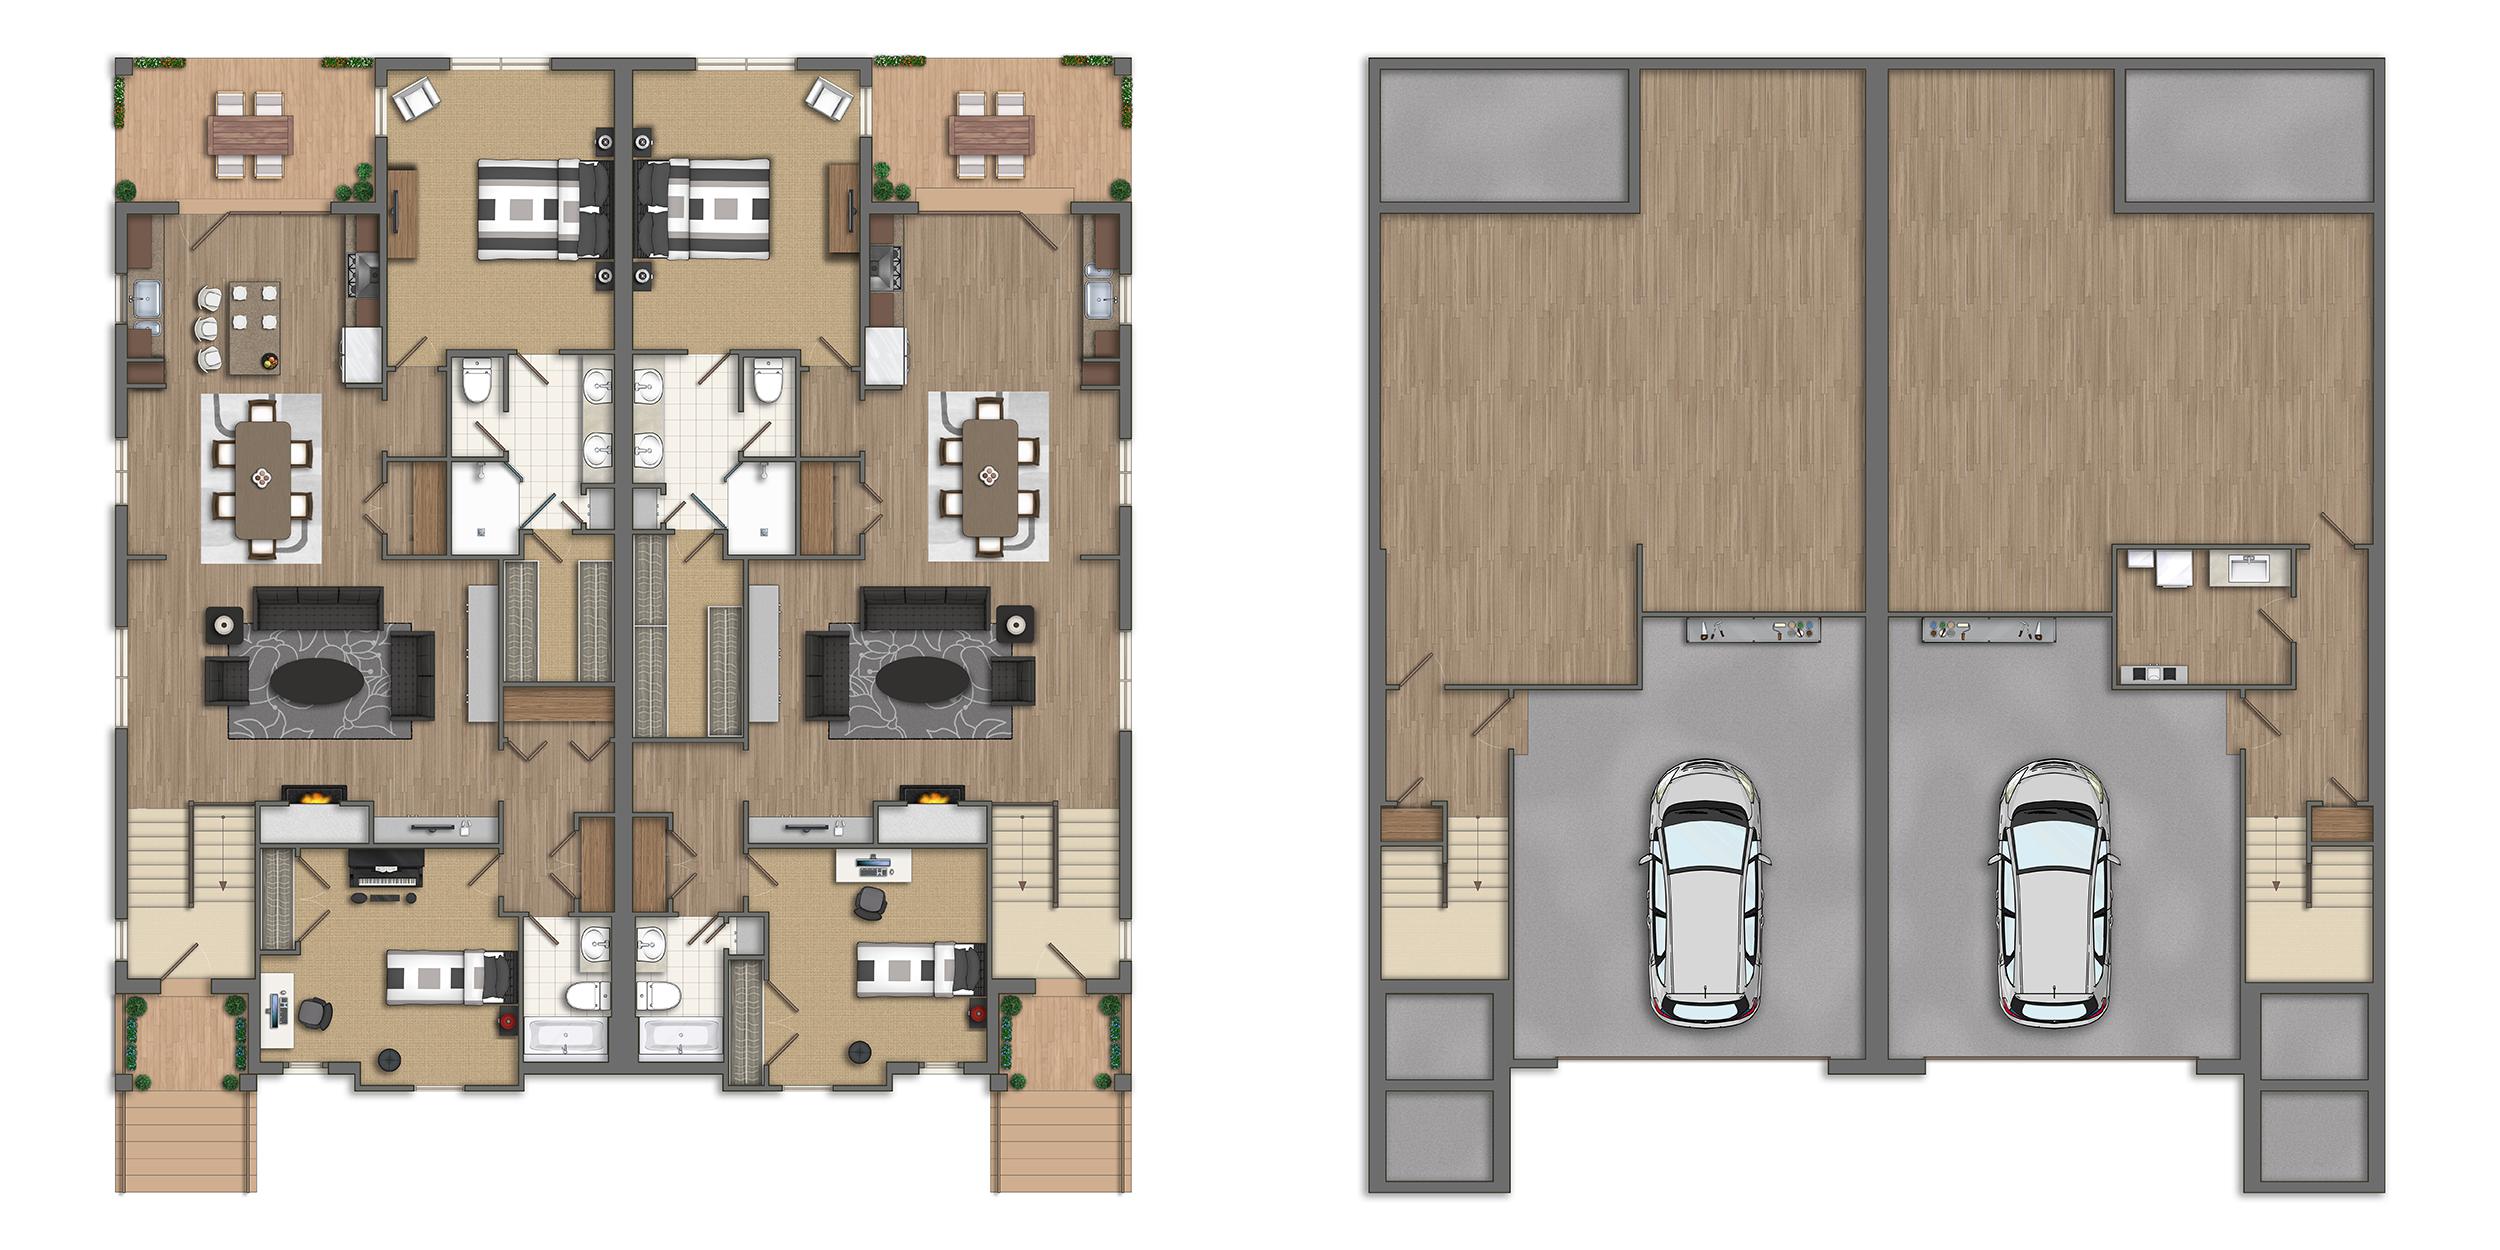 Photoshop planos 2d casas americanas - Casas americanas planos ...